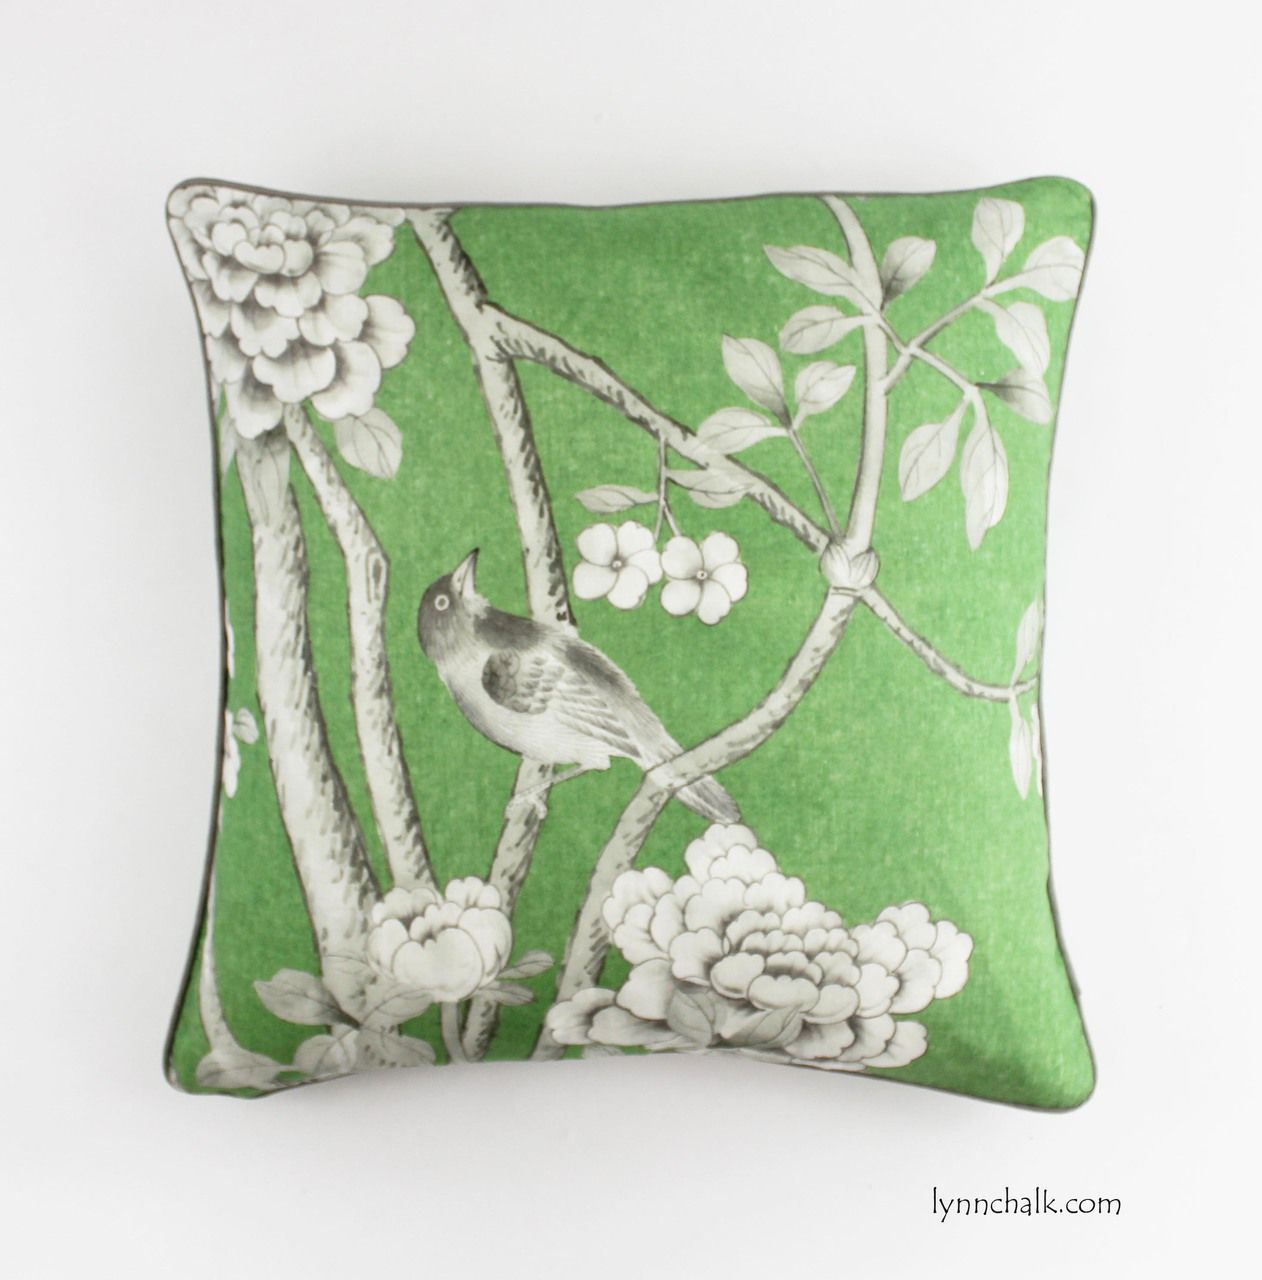 Schumacher mary mcdonald chinois palais pillows in lettuce wgrey